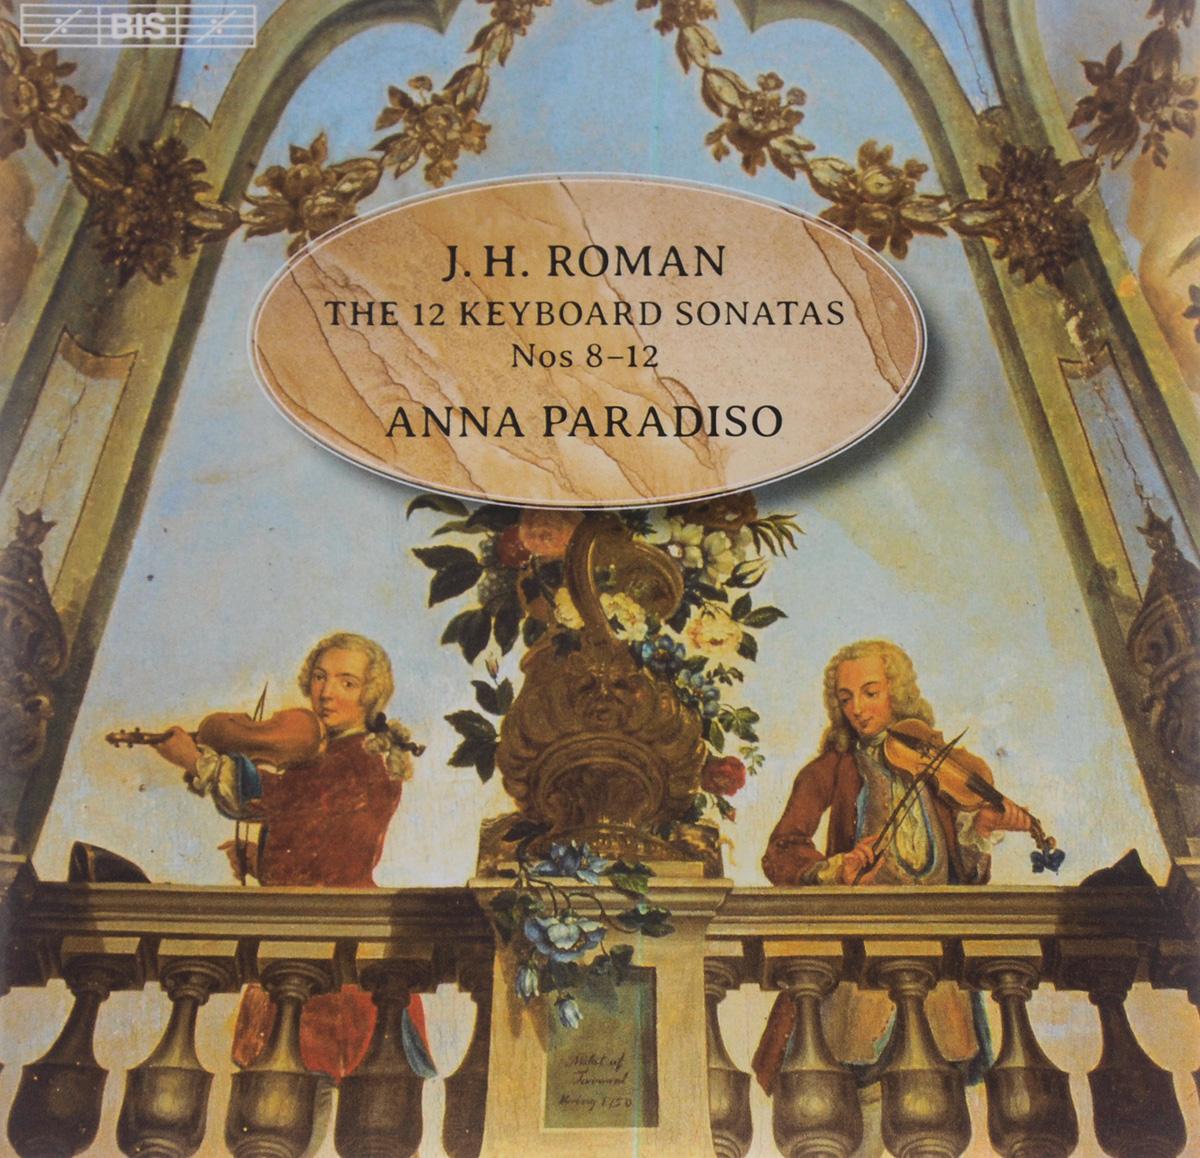 Anna Paradiso Anna Paradiso. J. H. Roman. 12 Keyboard Sonatas Nos. 8-12 / Johan Agrell. Sonata II In C Major (SACD)